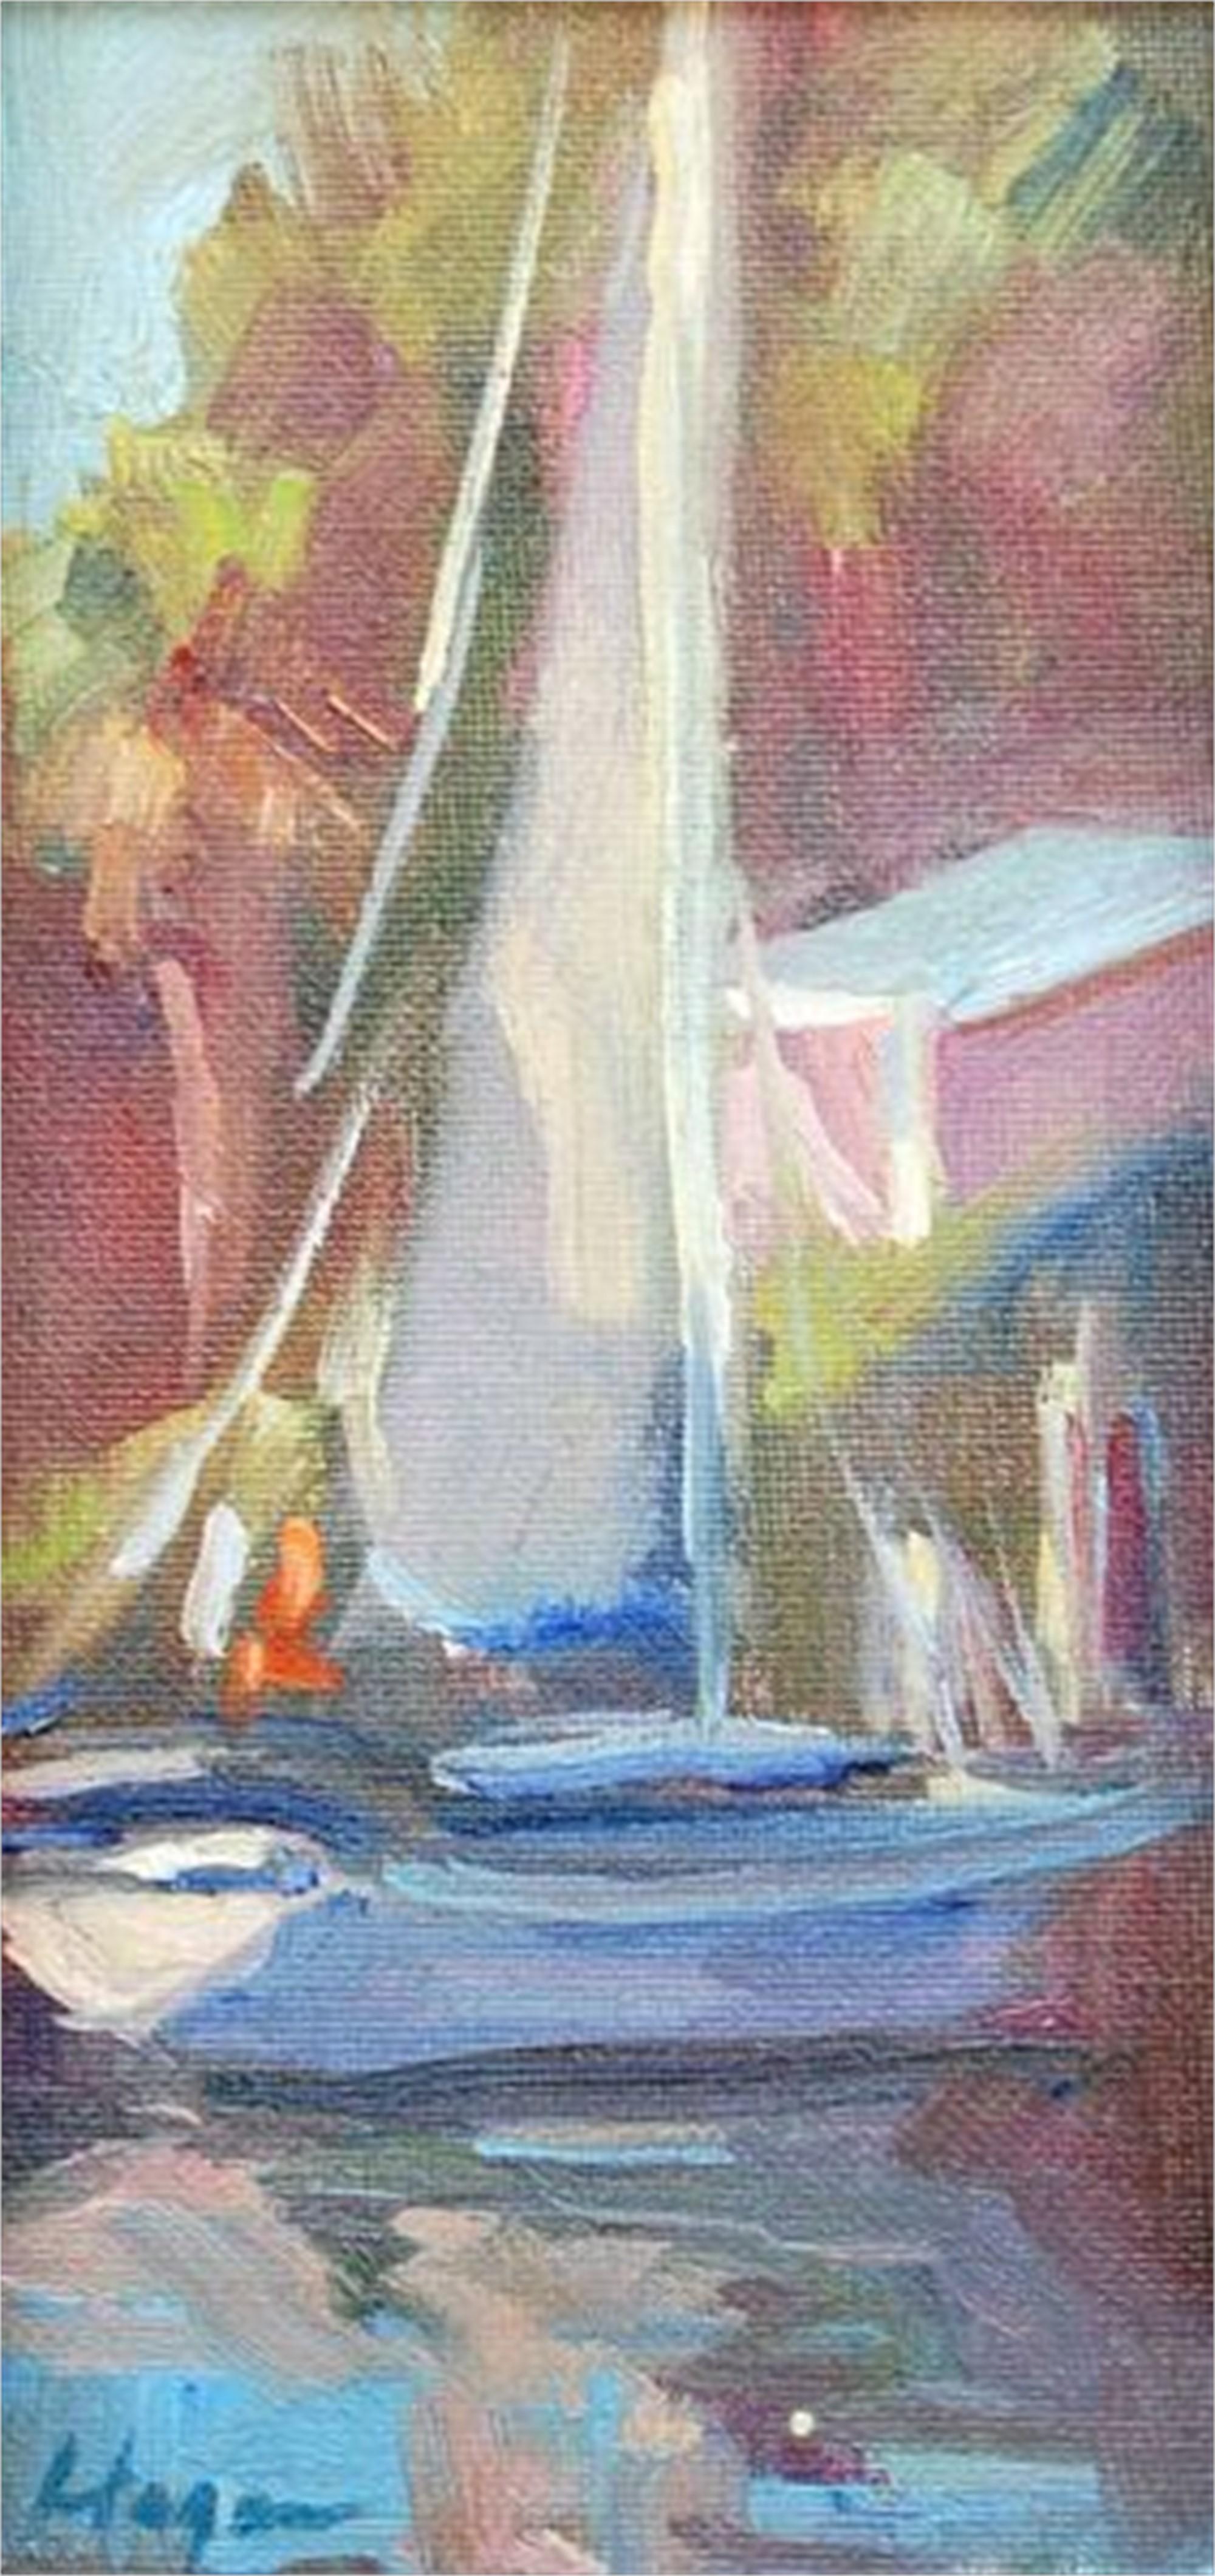 Docked at Hope Town II by Karen Hewitt Hagan